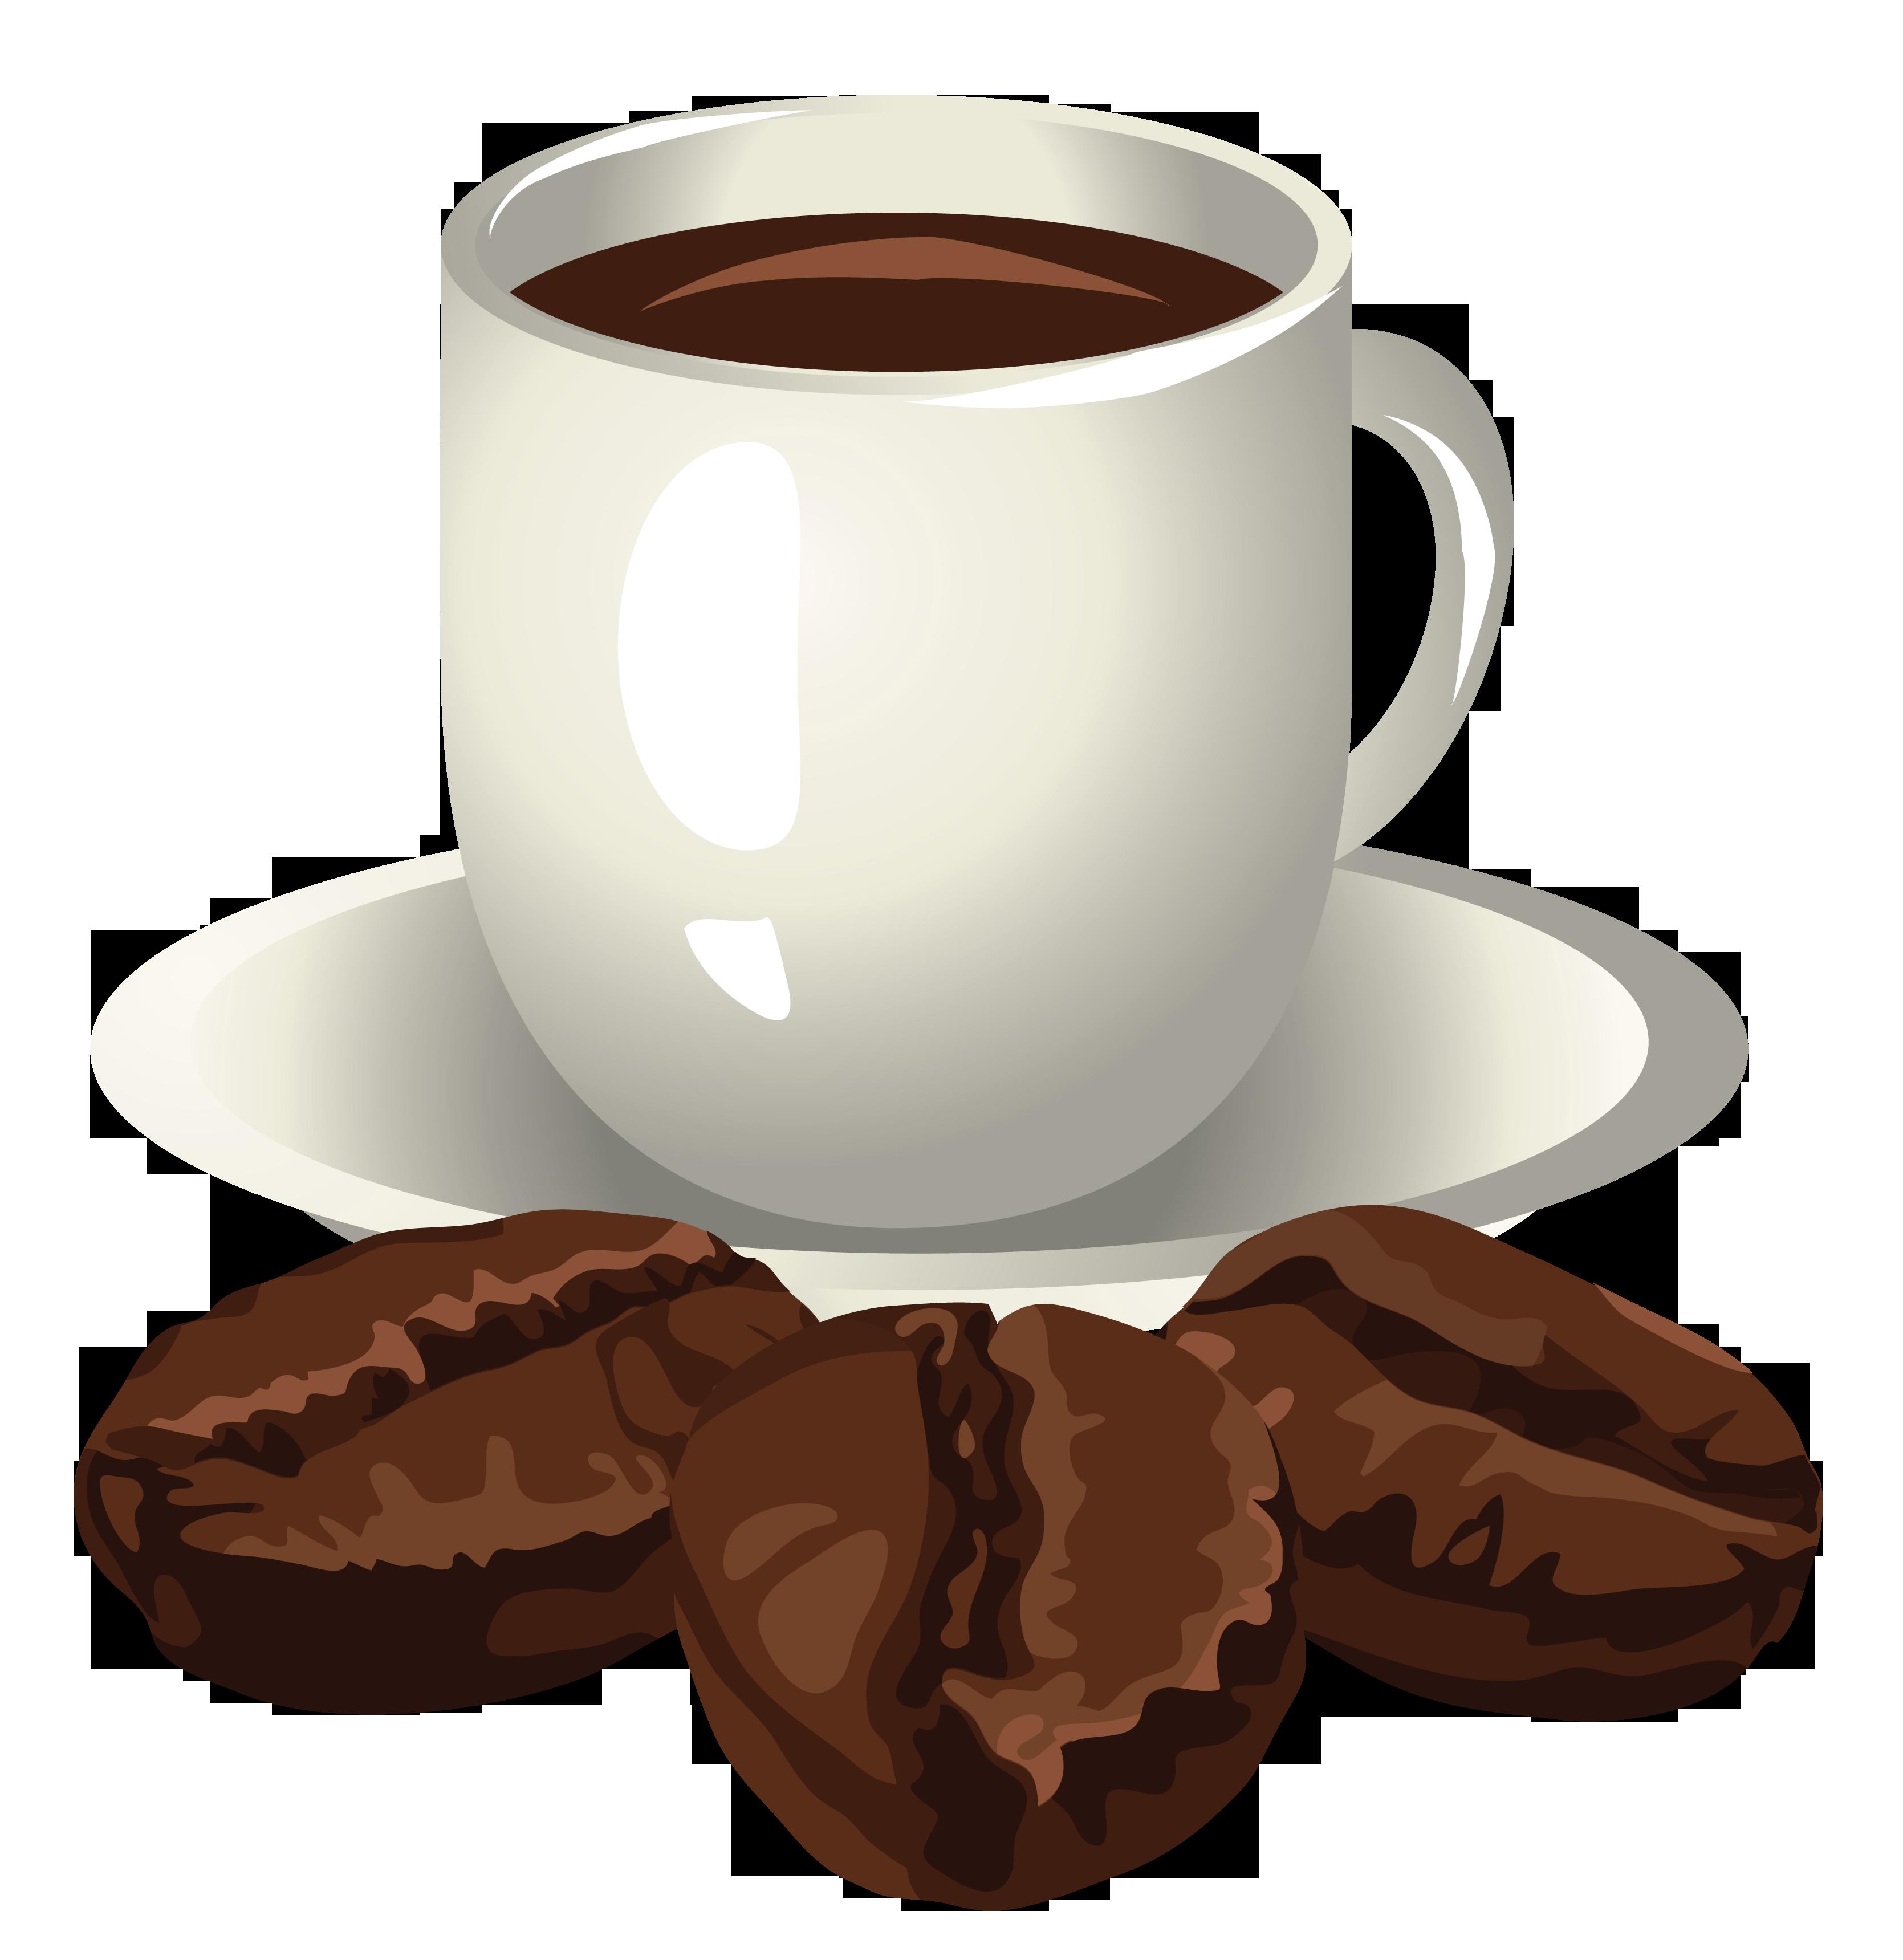 Free coffee clipart clip art - Vergilis Clipart ...